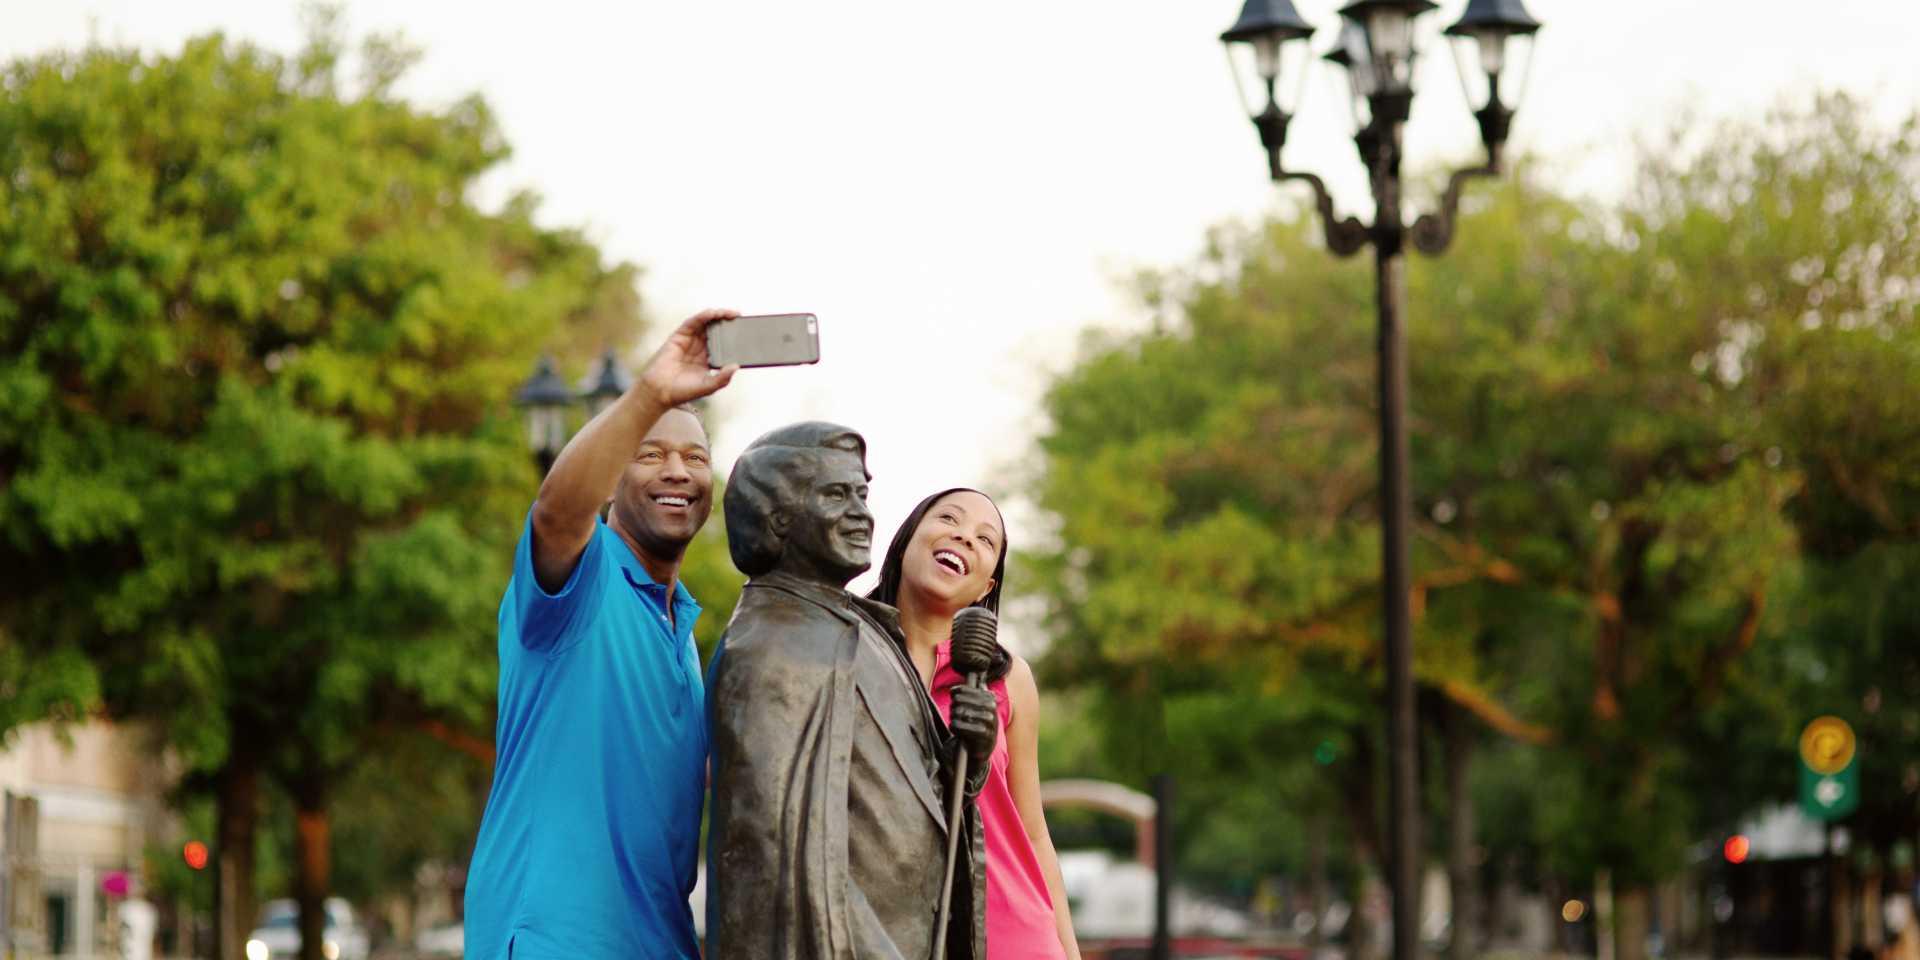 James Brown Couple Selfie